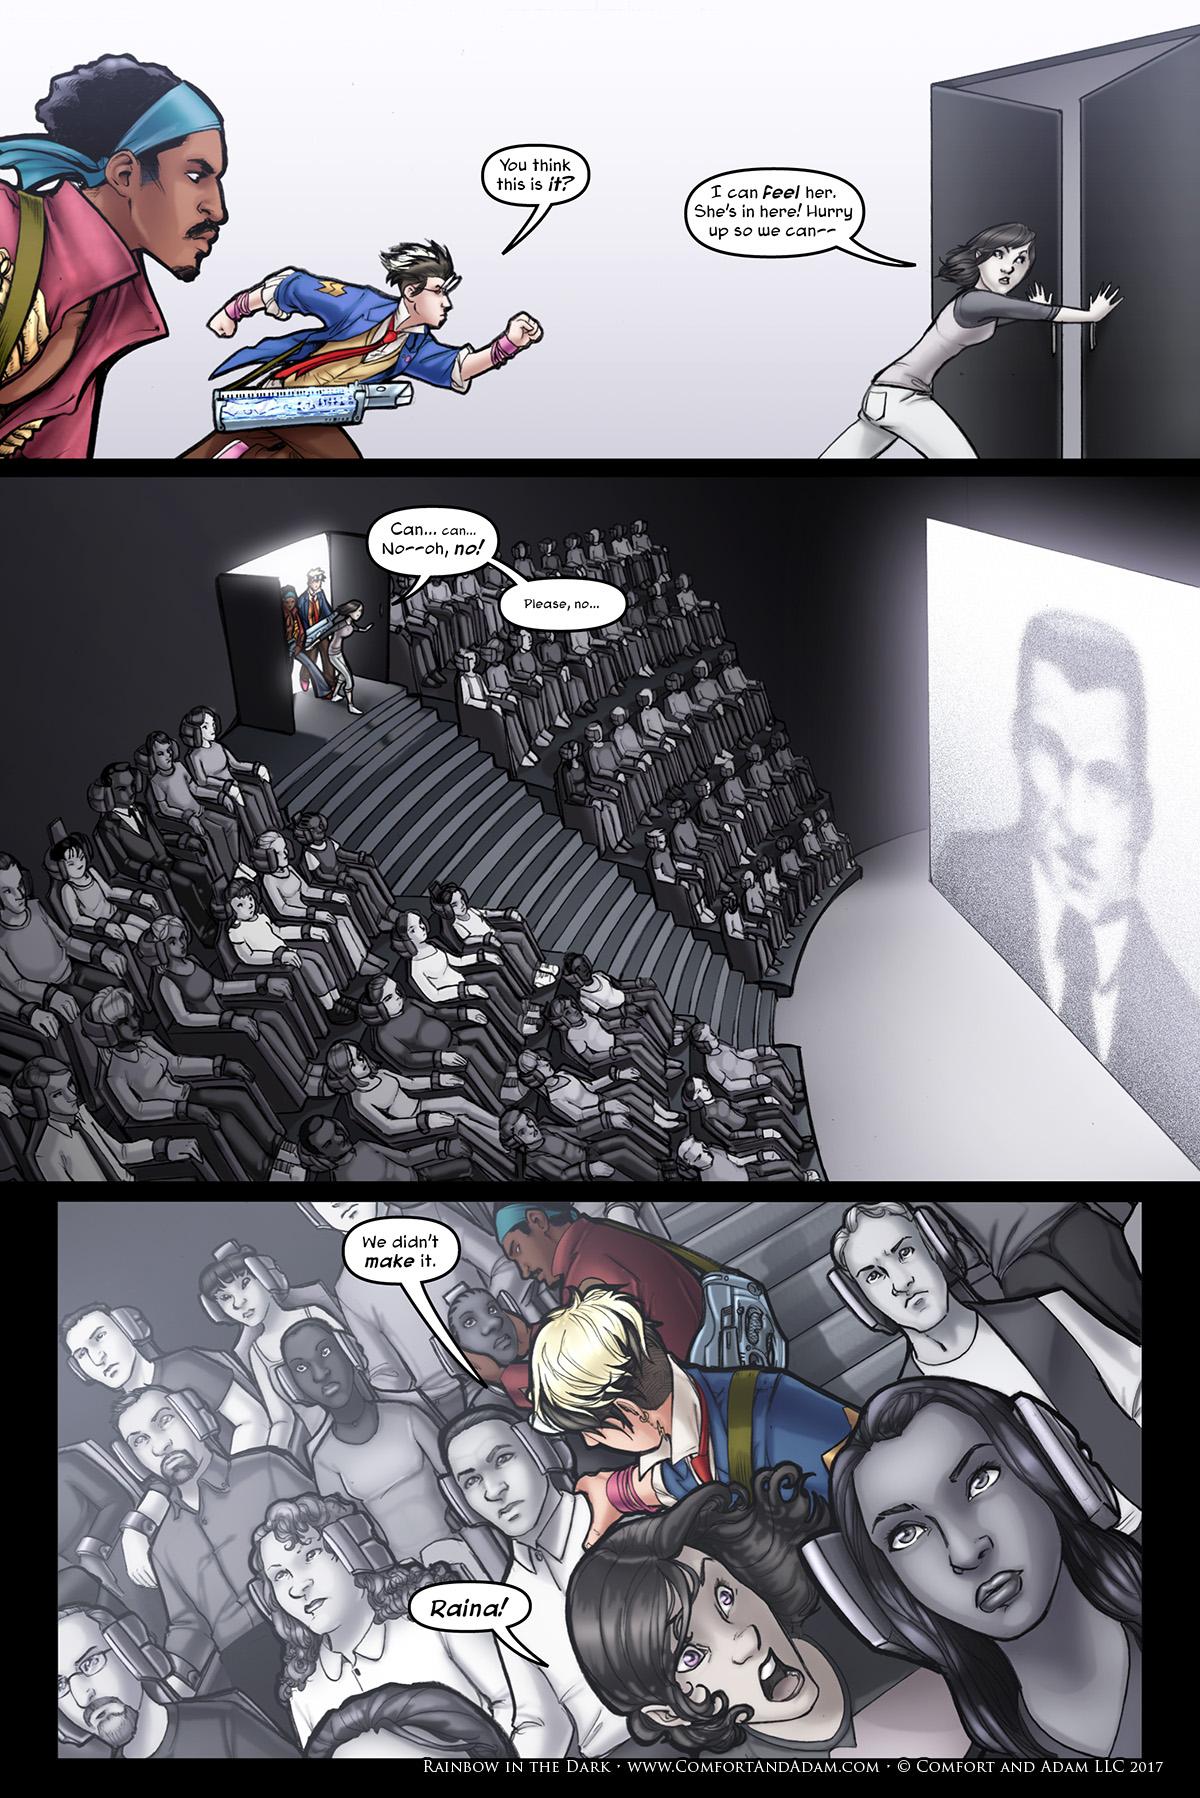 Rainbow in the Dark #3, pg. 17: Reeducation